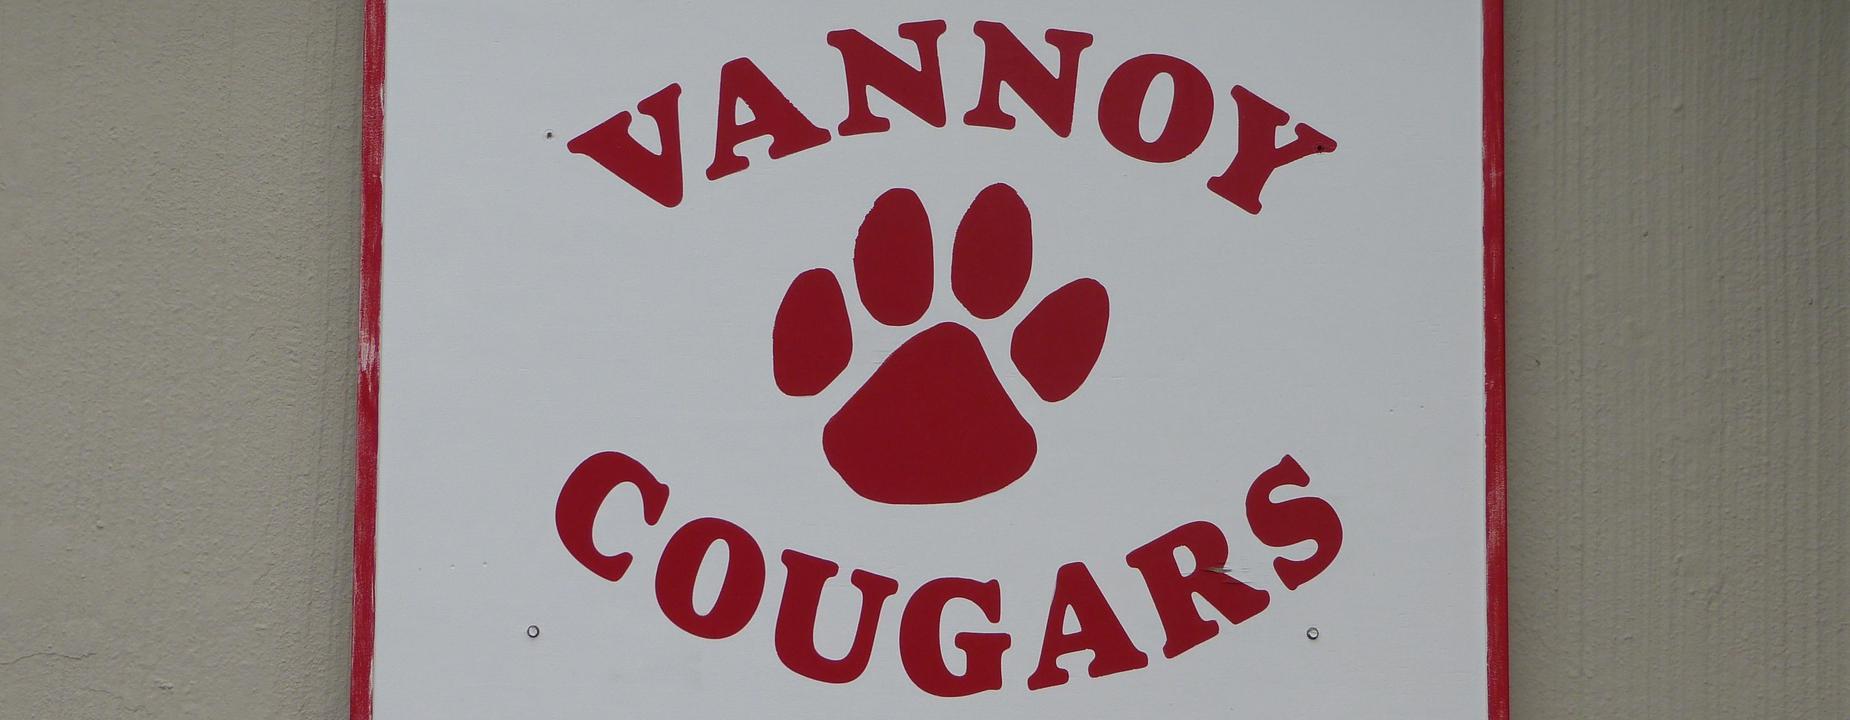 vannoy cougars logo